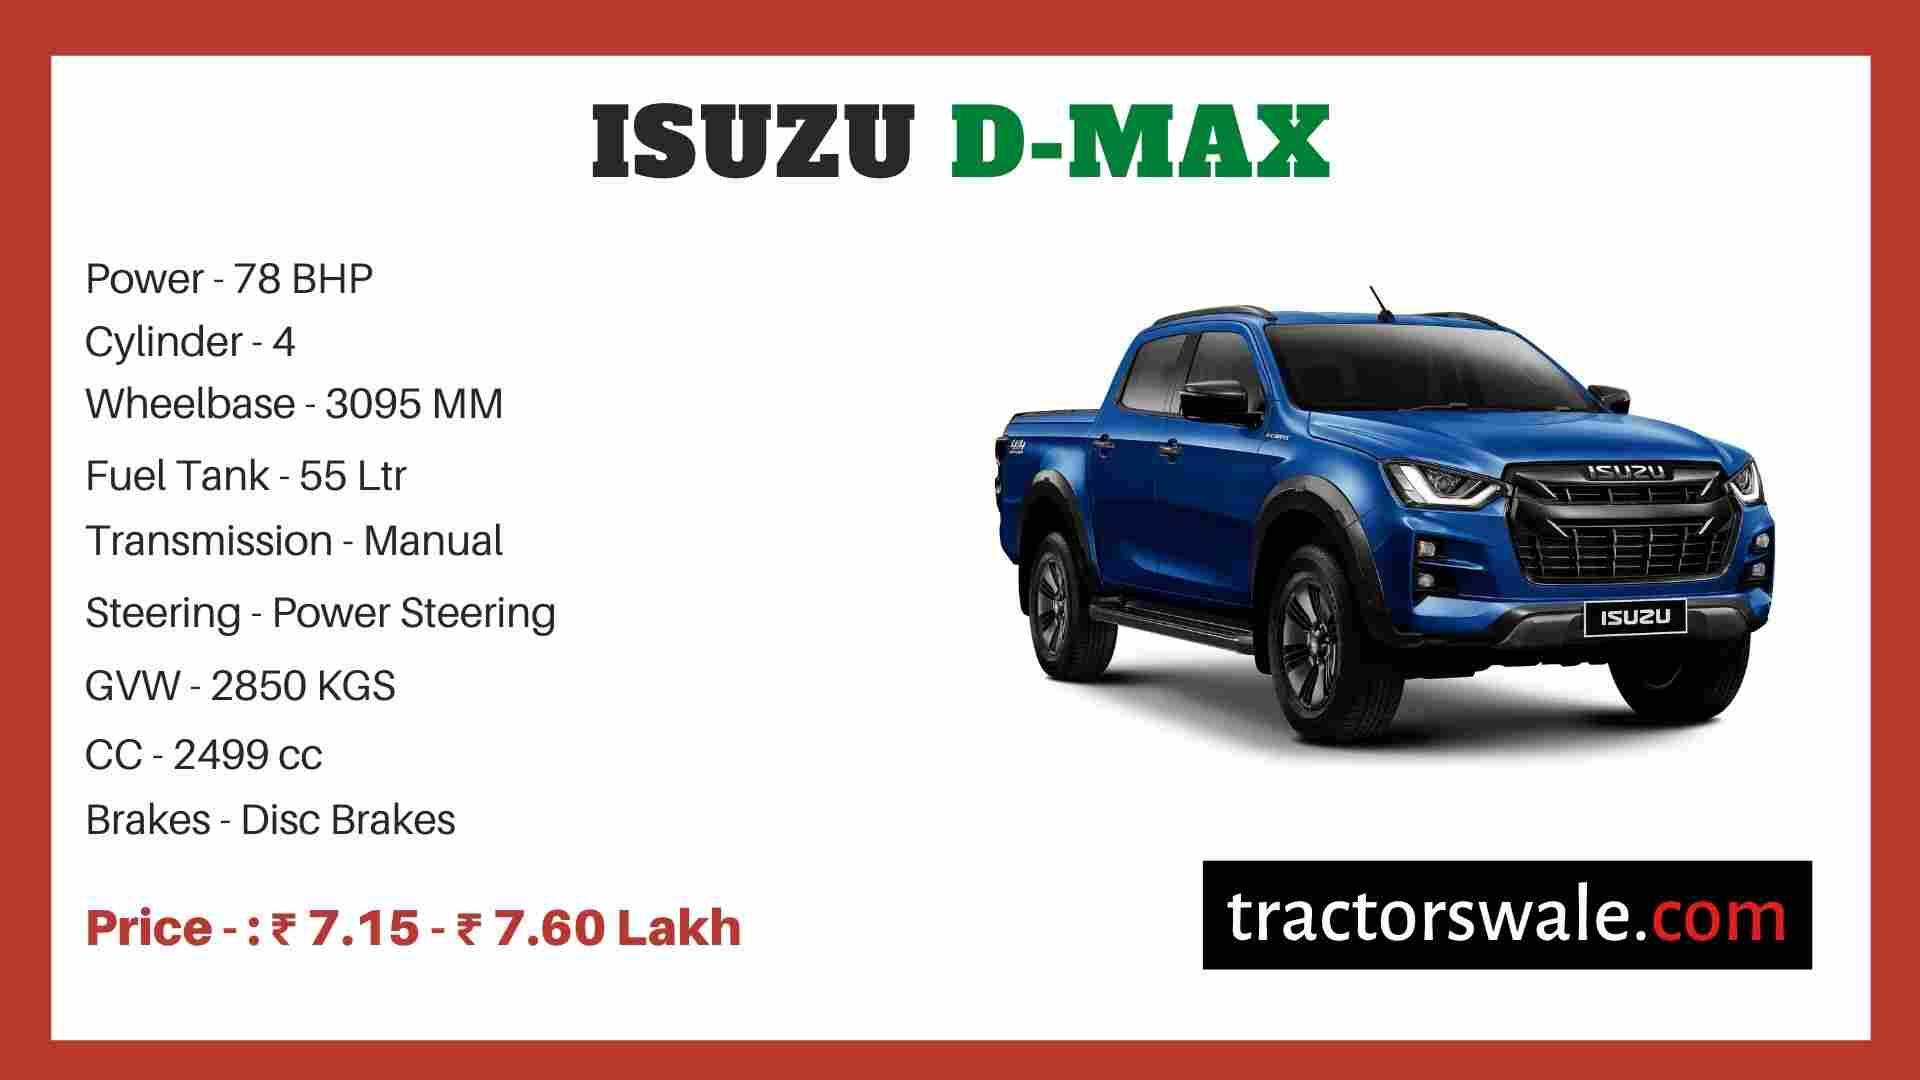 Isuzu D-MAX price